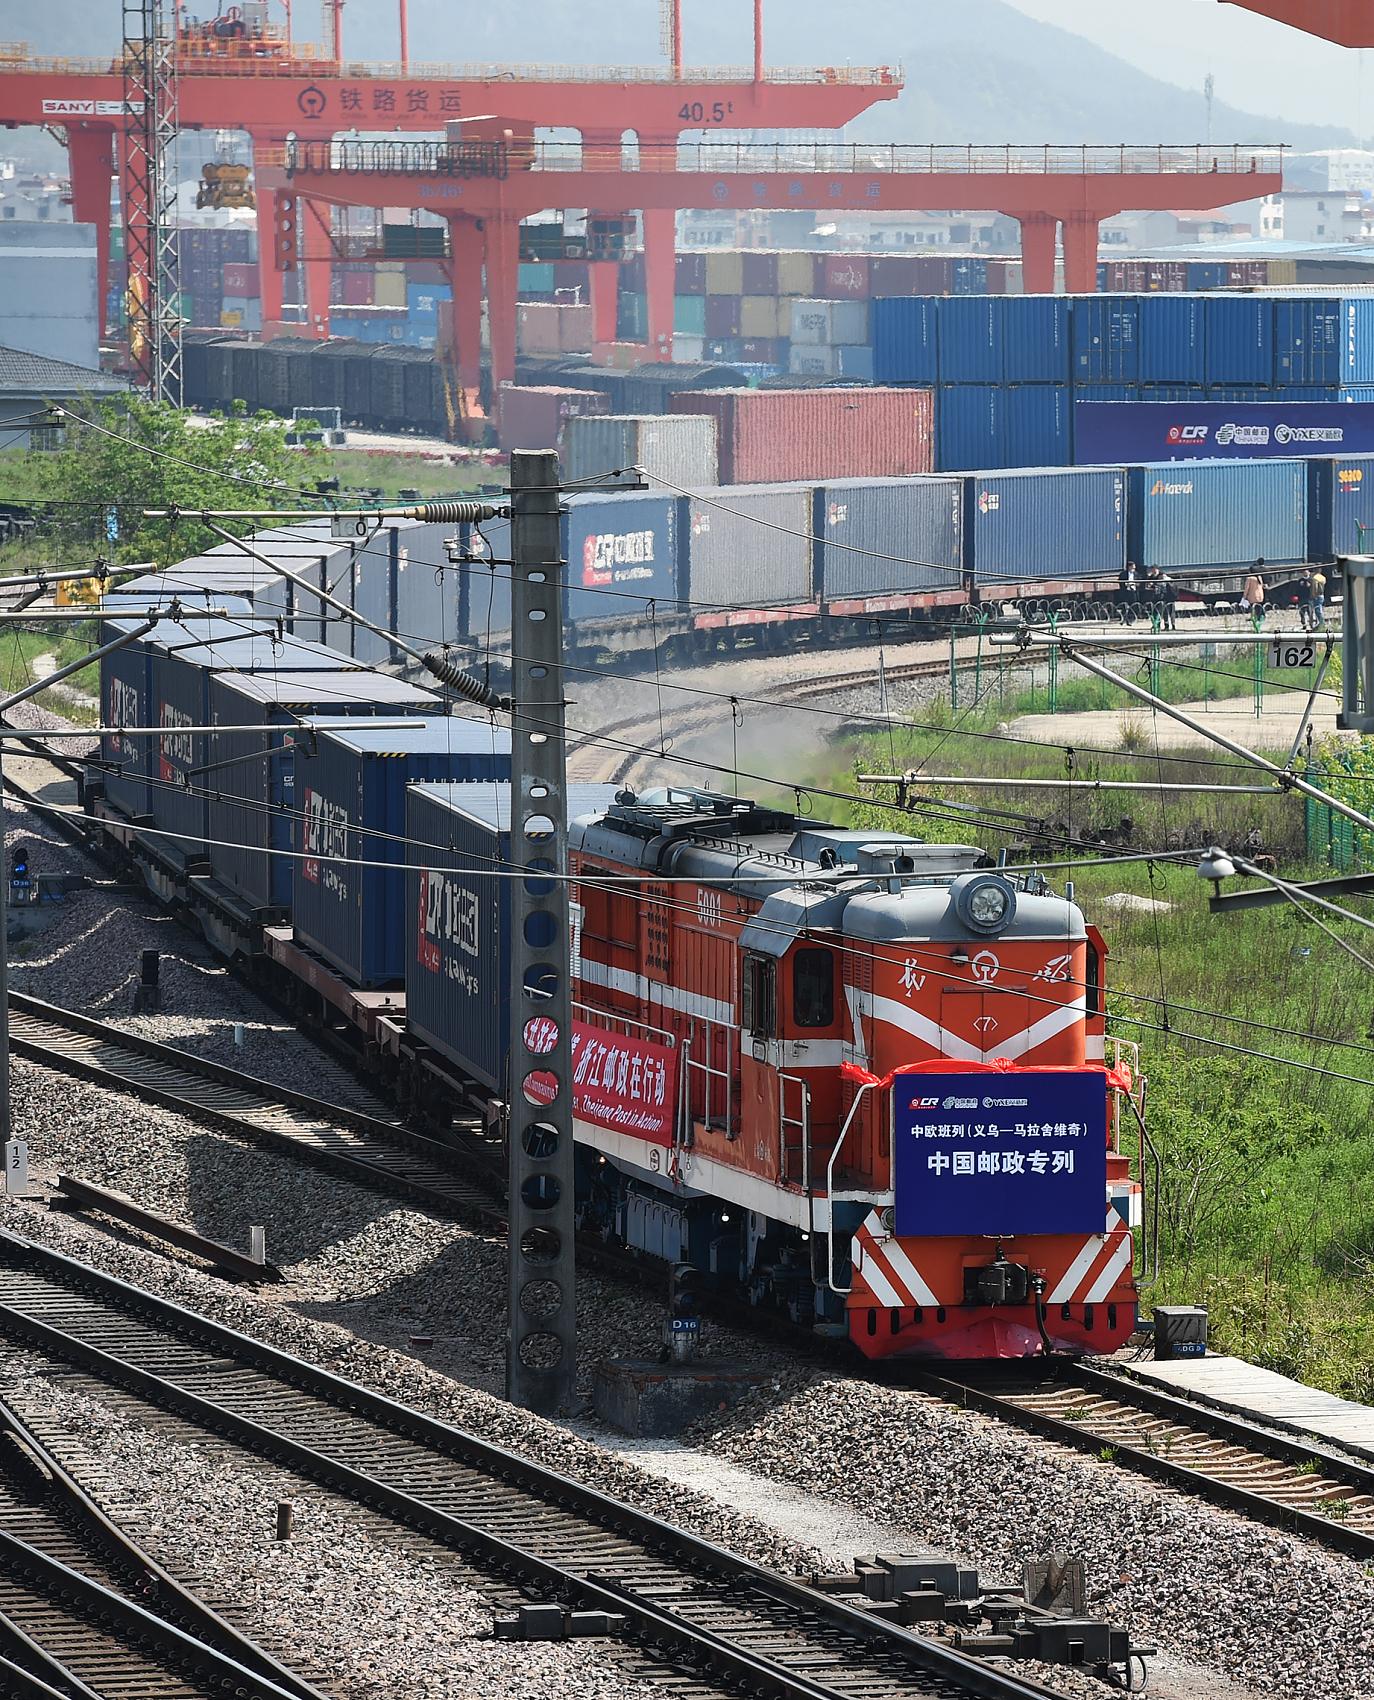 China-Europe freight train transports anti-COVID-19 supplies to Poland